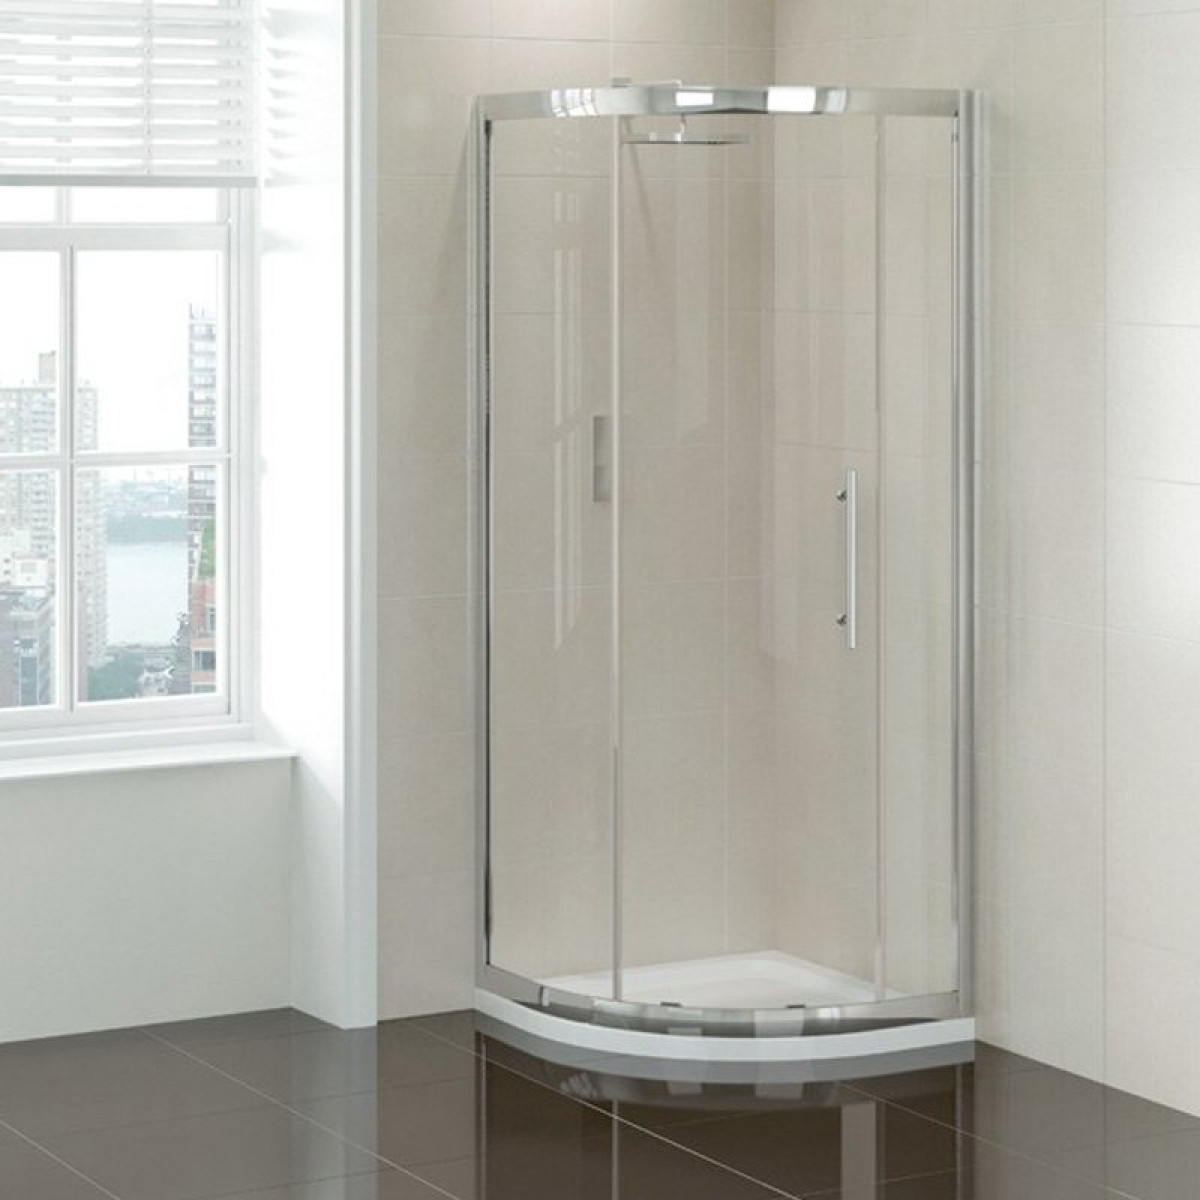 April Prestige 1200x900 Single Door Offset Quadrant Shower